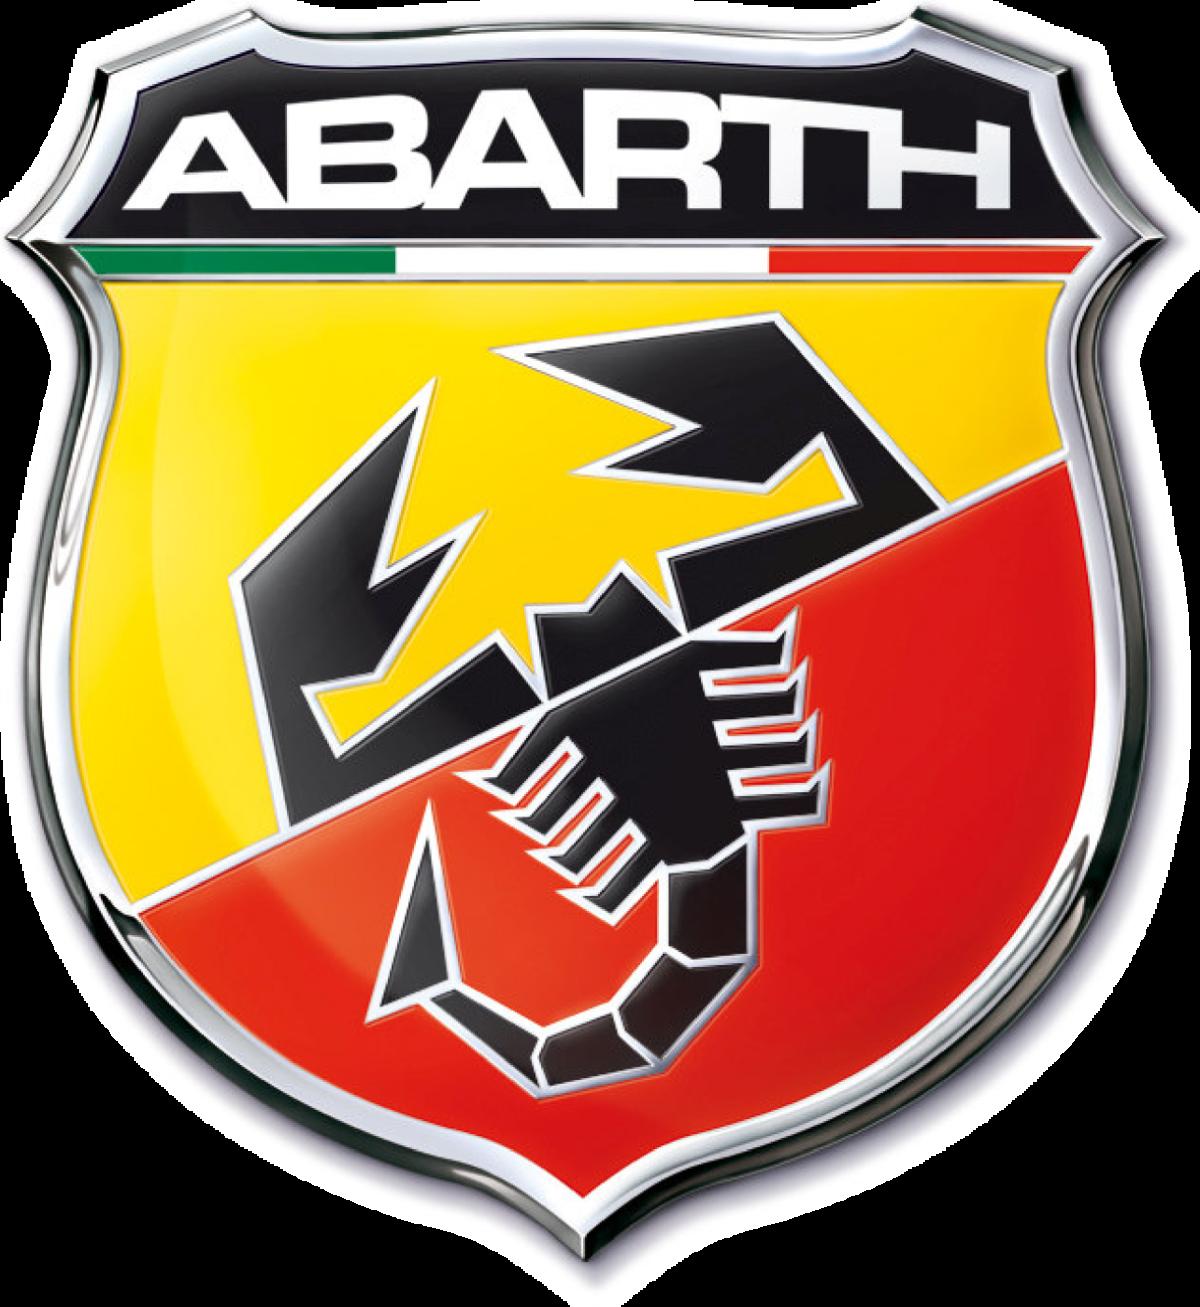 Abarth - Wikipedia